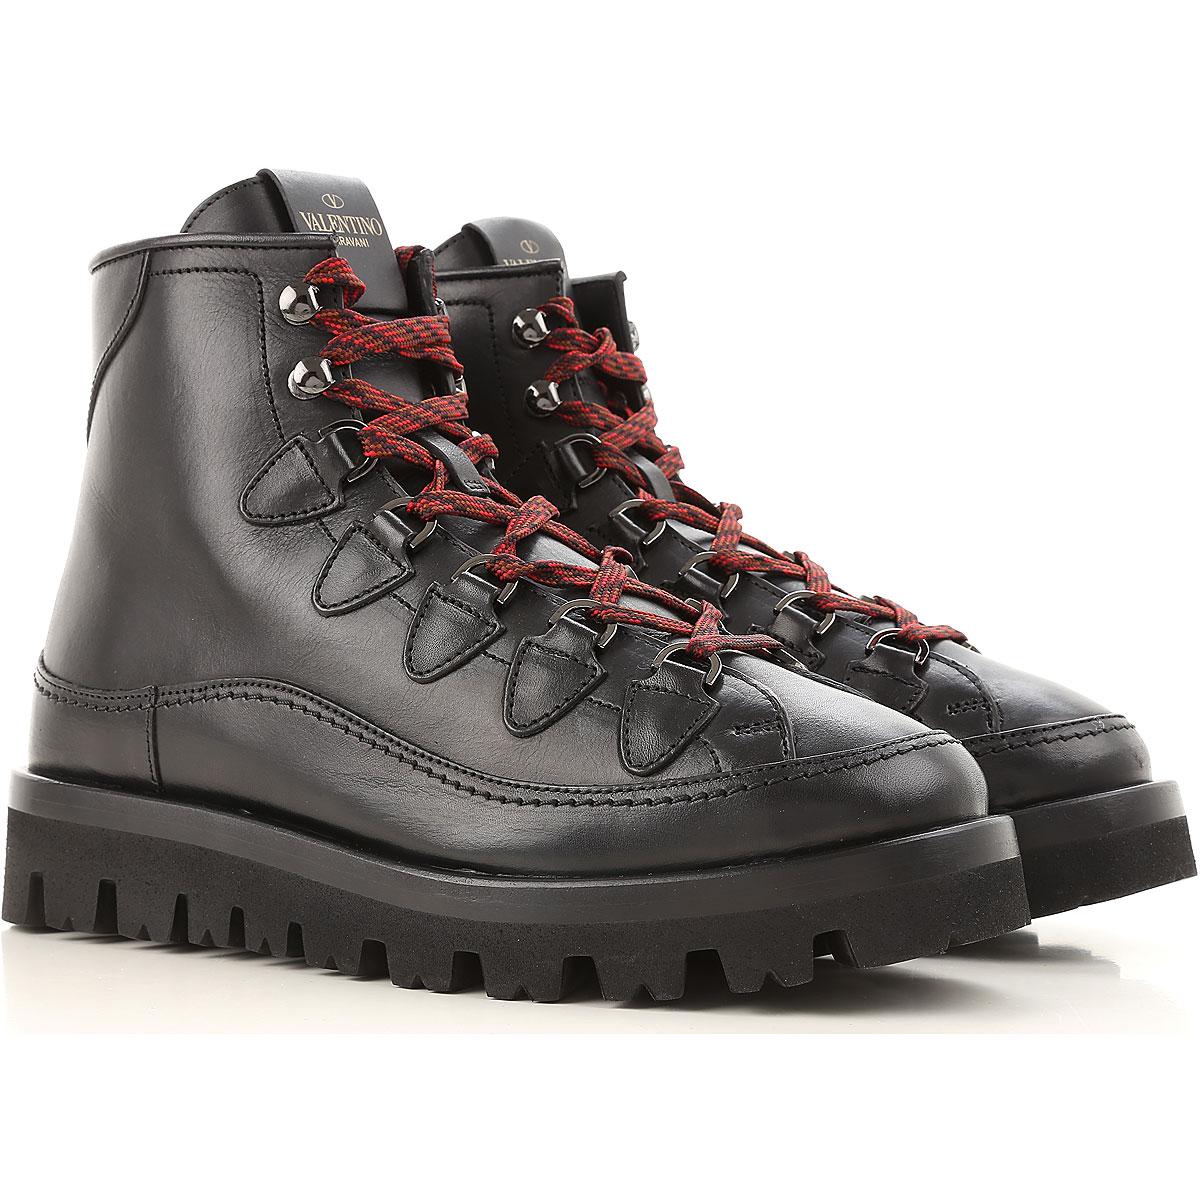 Mens Shoes Valentino Garavani, Style code: ny2s0a04-vac-0n0